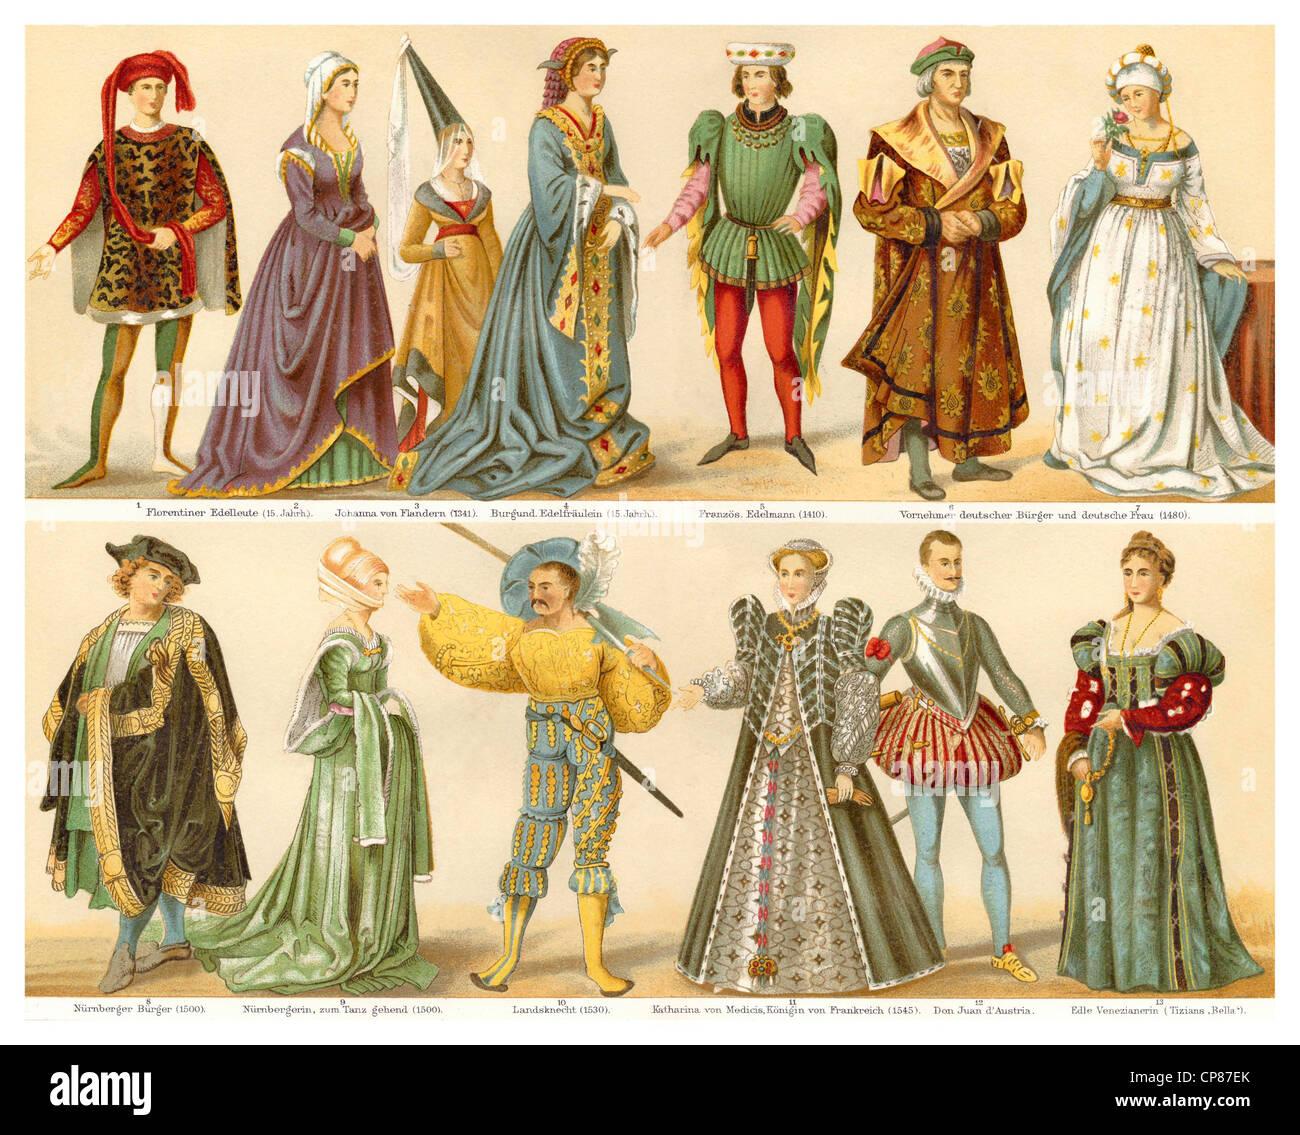 https www alamyimages fr photo image les costumes la mode les vetements 15e et 16e siecle historische zeichnerische darstellung 19 jahrhundert aus meyers konversa 48124683 html